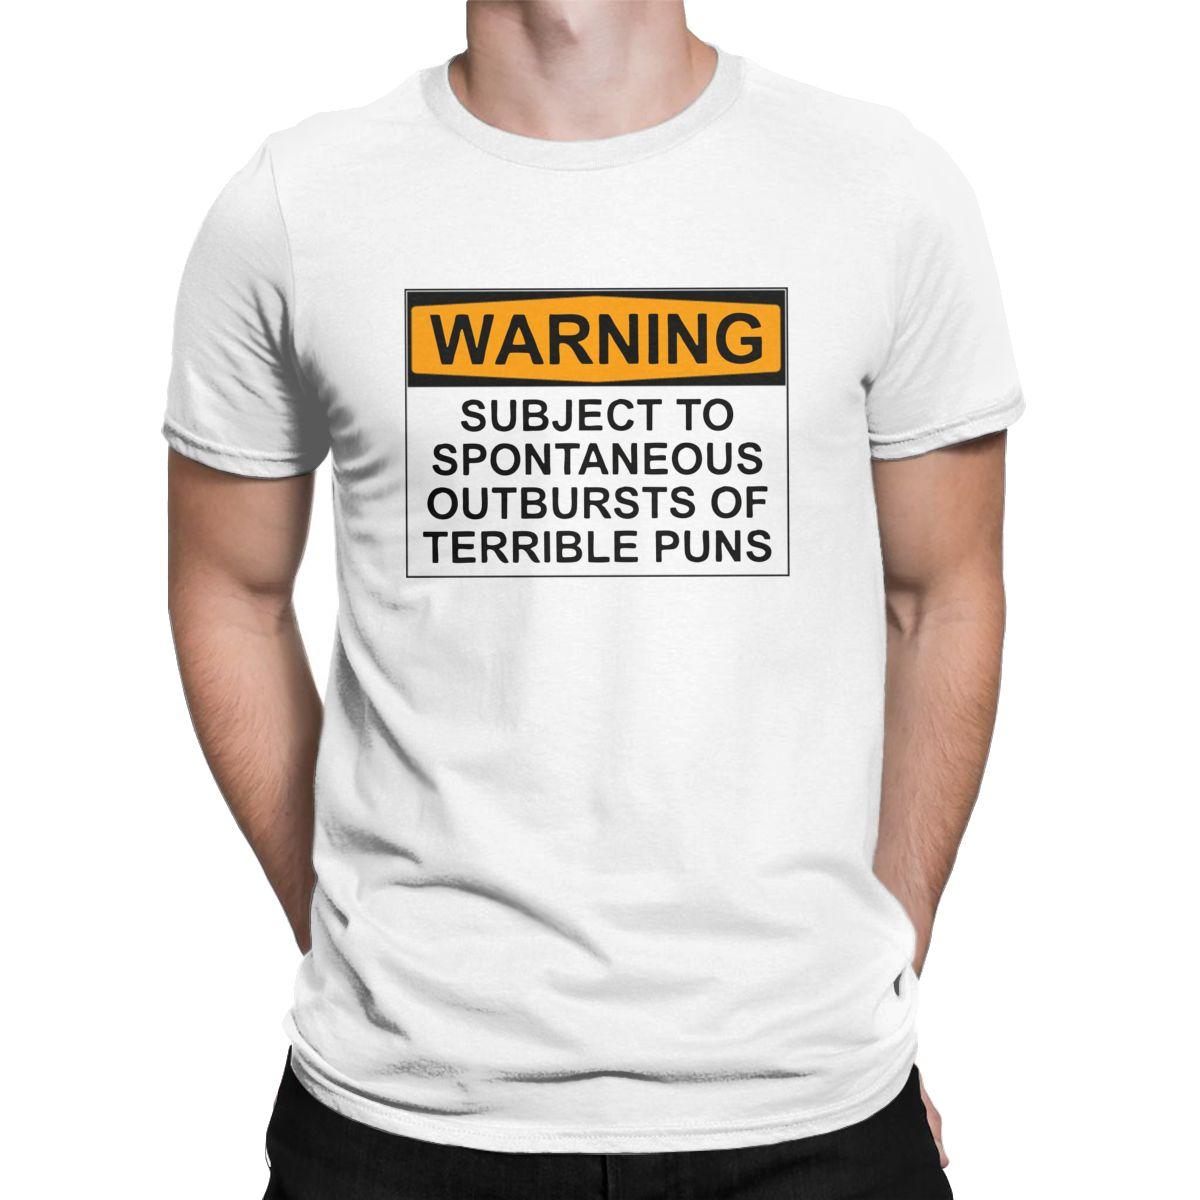 Men's T-Shirt WARNING Joke Casual Pure Cotton Tees Subject to Spontaneous Outbursts of Terrible Puns T Shirts 4XL 5XL 6XL